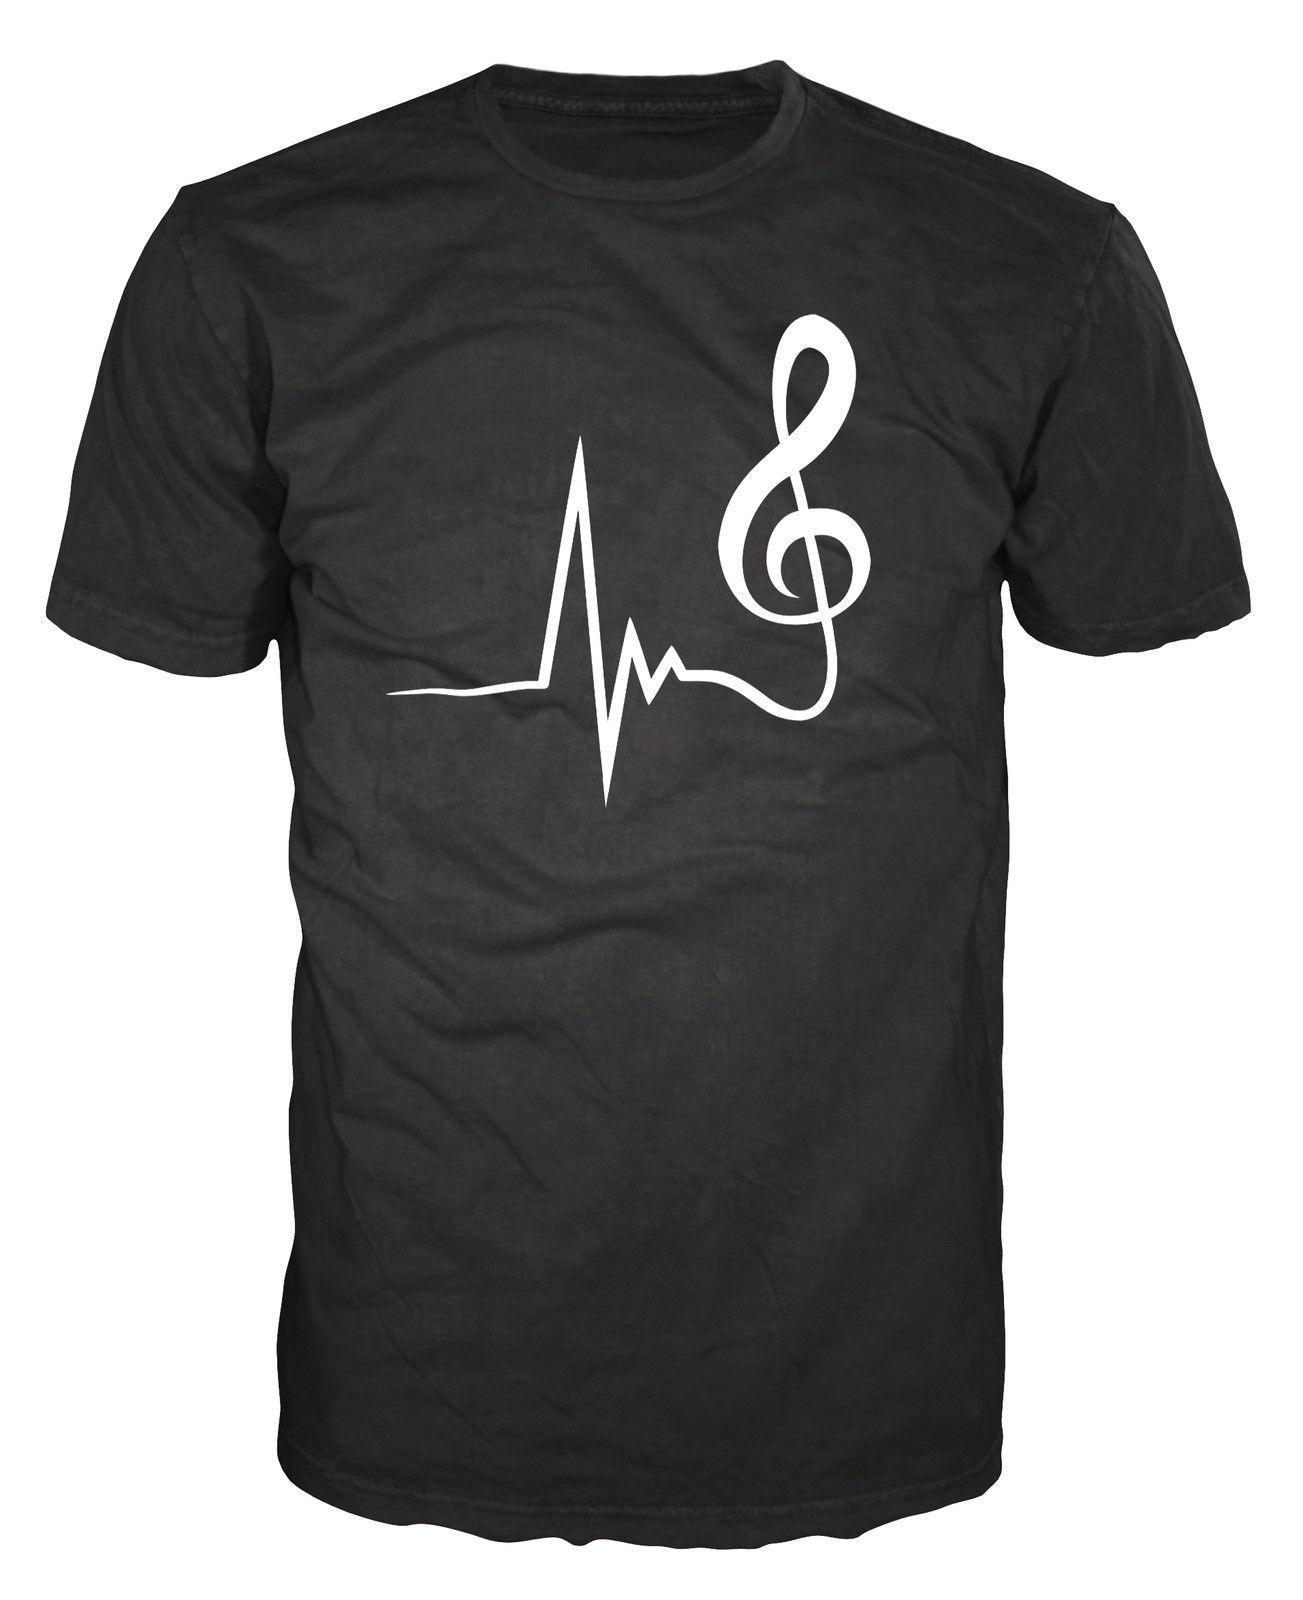 Compre Nota Musical Banda Urbana Músico Instrumento Guitarrista DJ  Productor Camiseta Camiseta Divertida Hombres Alta Calidad Tops Camisetas  Hombres 100% ... f51f1301f1cdd